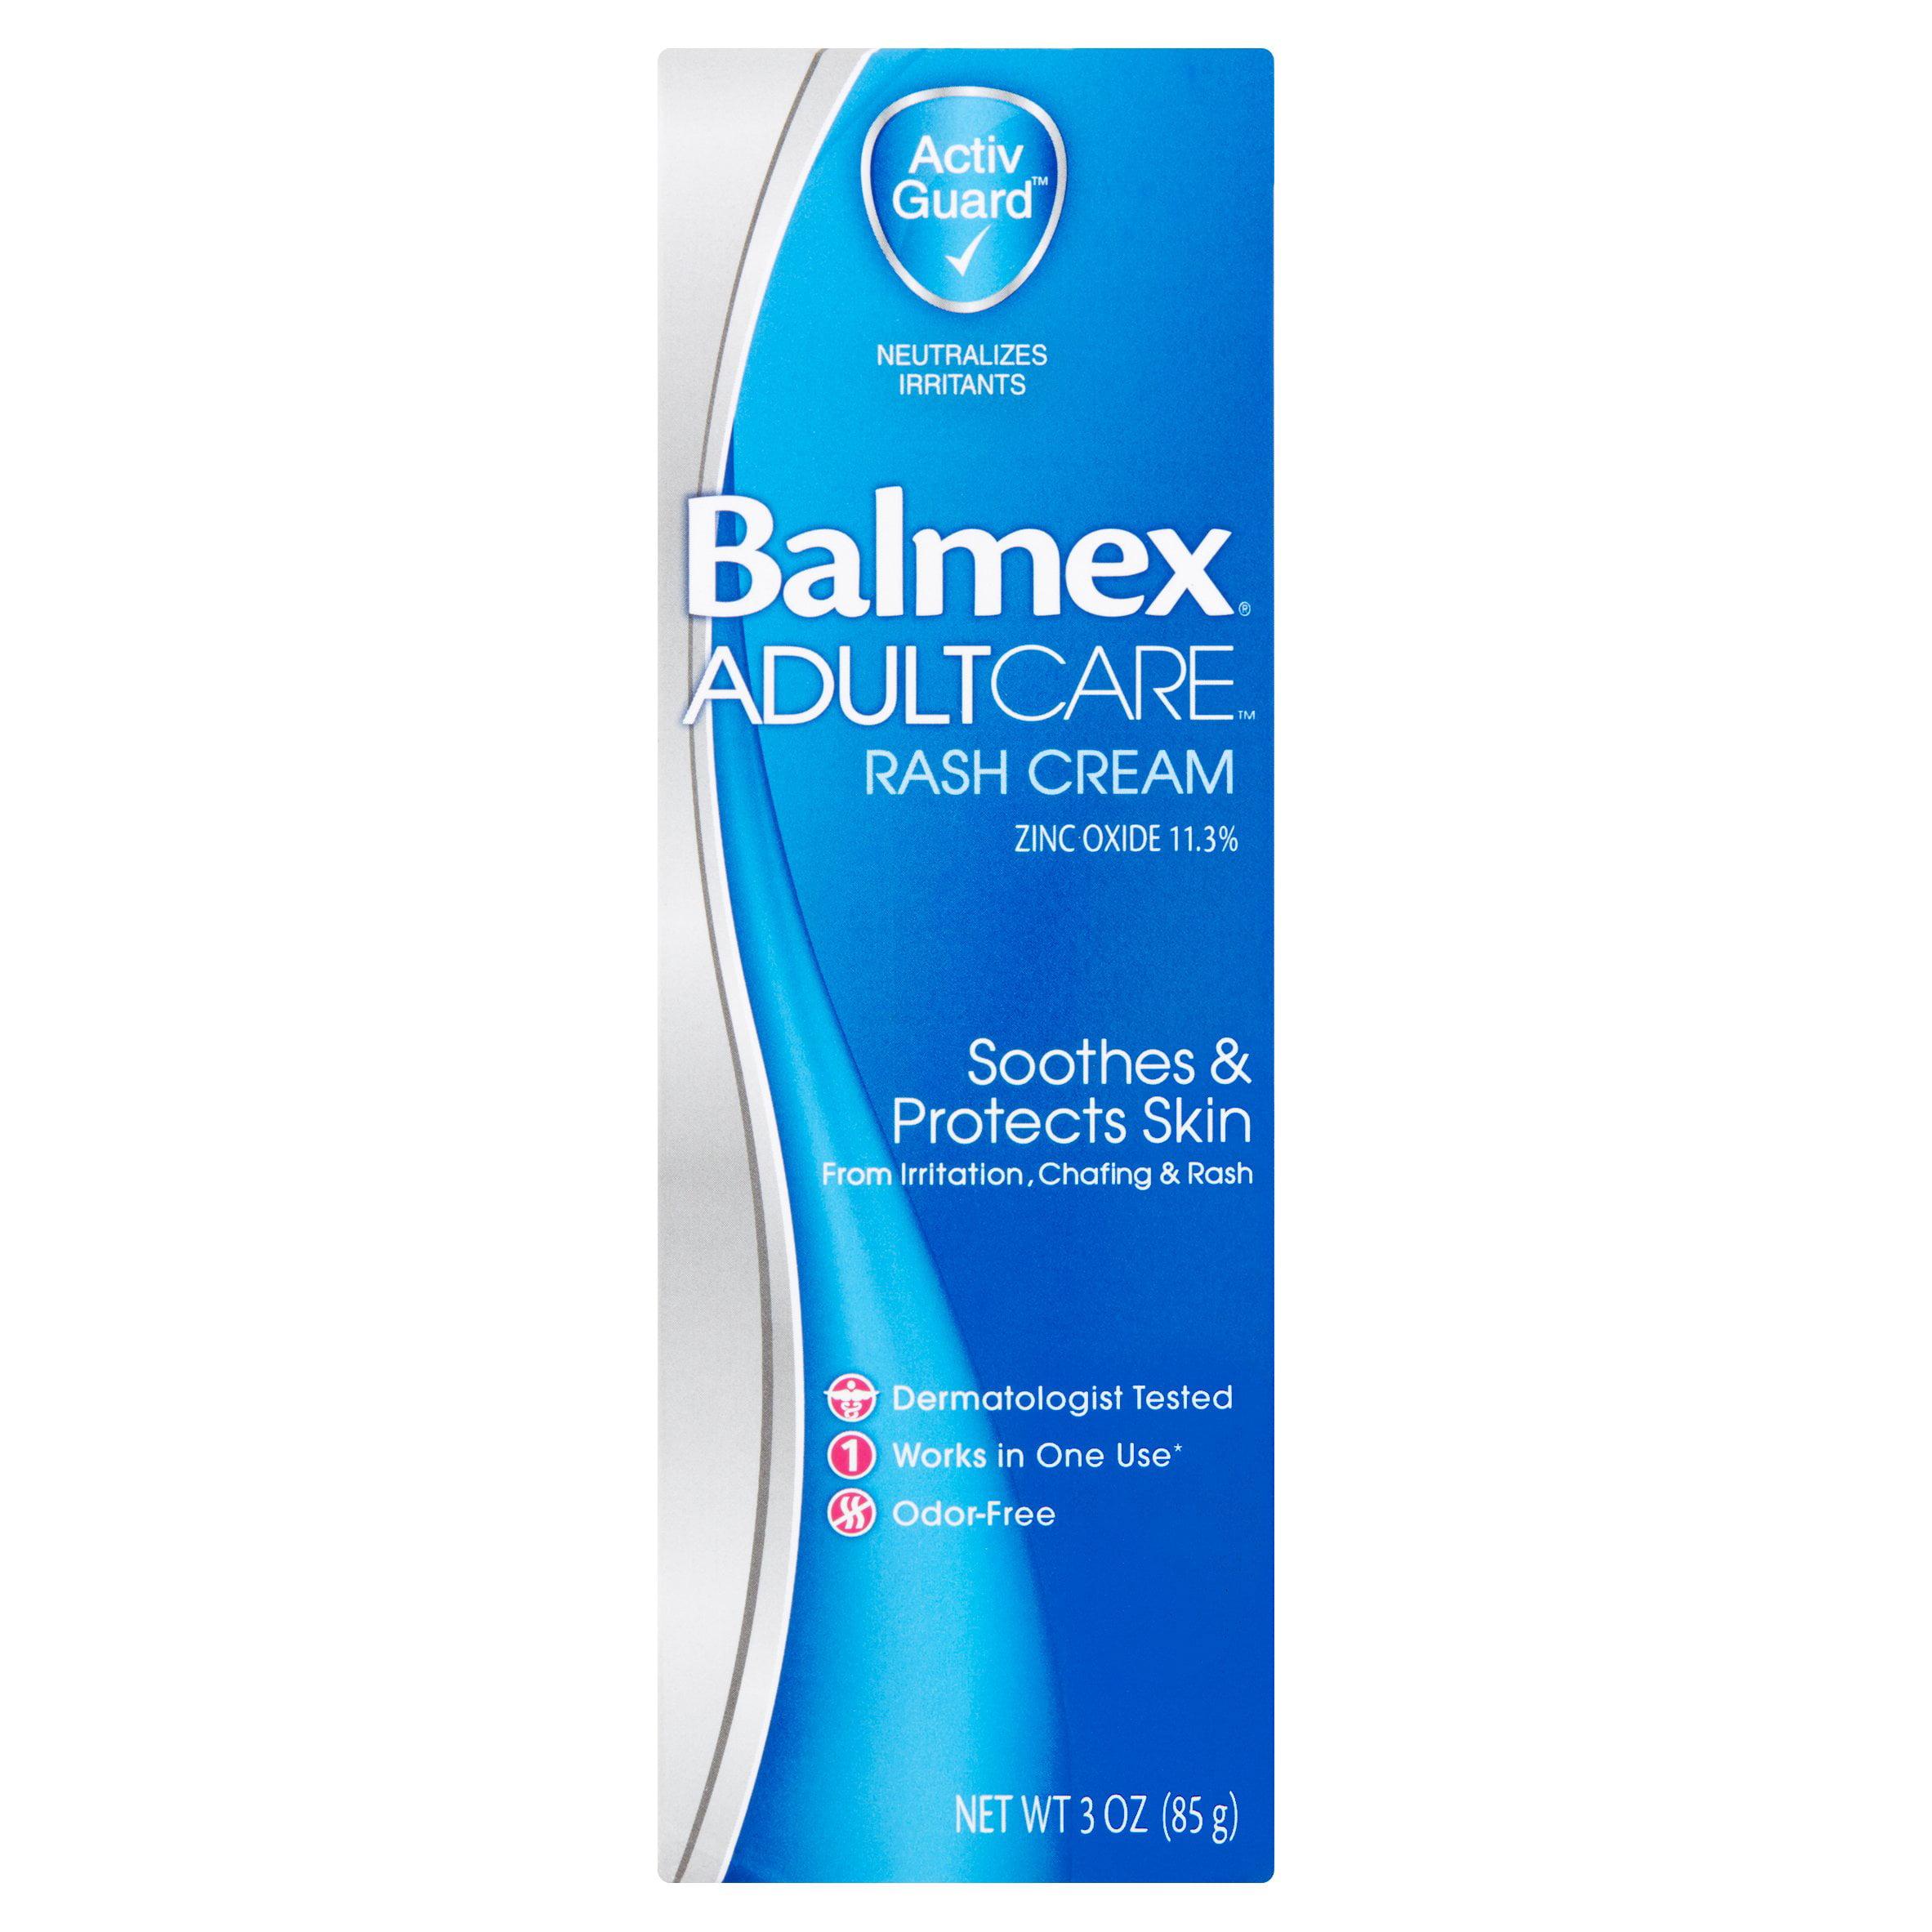 Balmex Adult Care Rash Cream, 3 oz by Moberg Pharma North America LLC